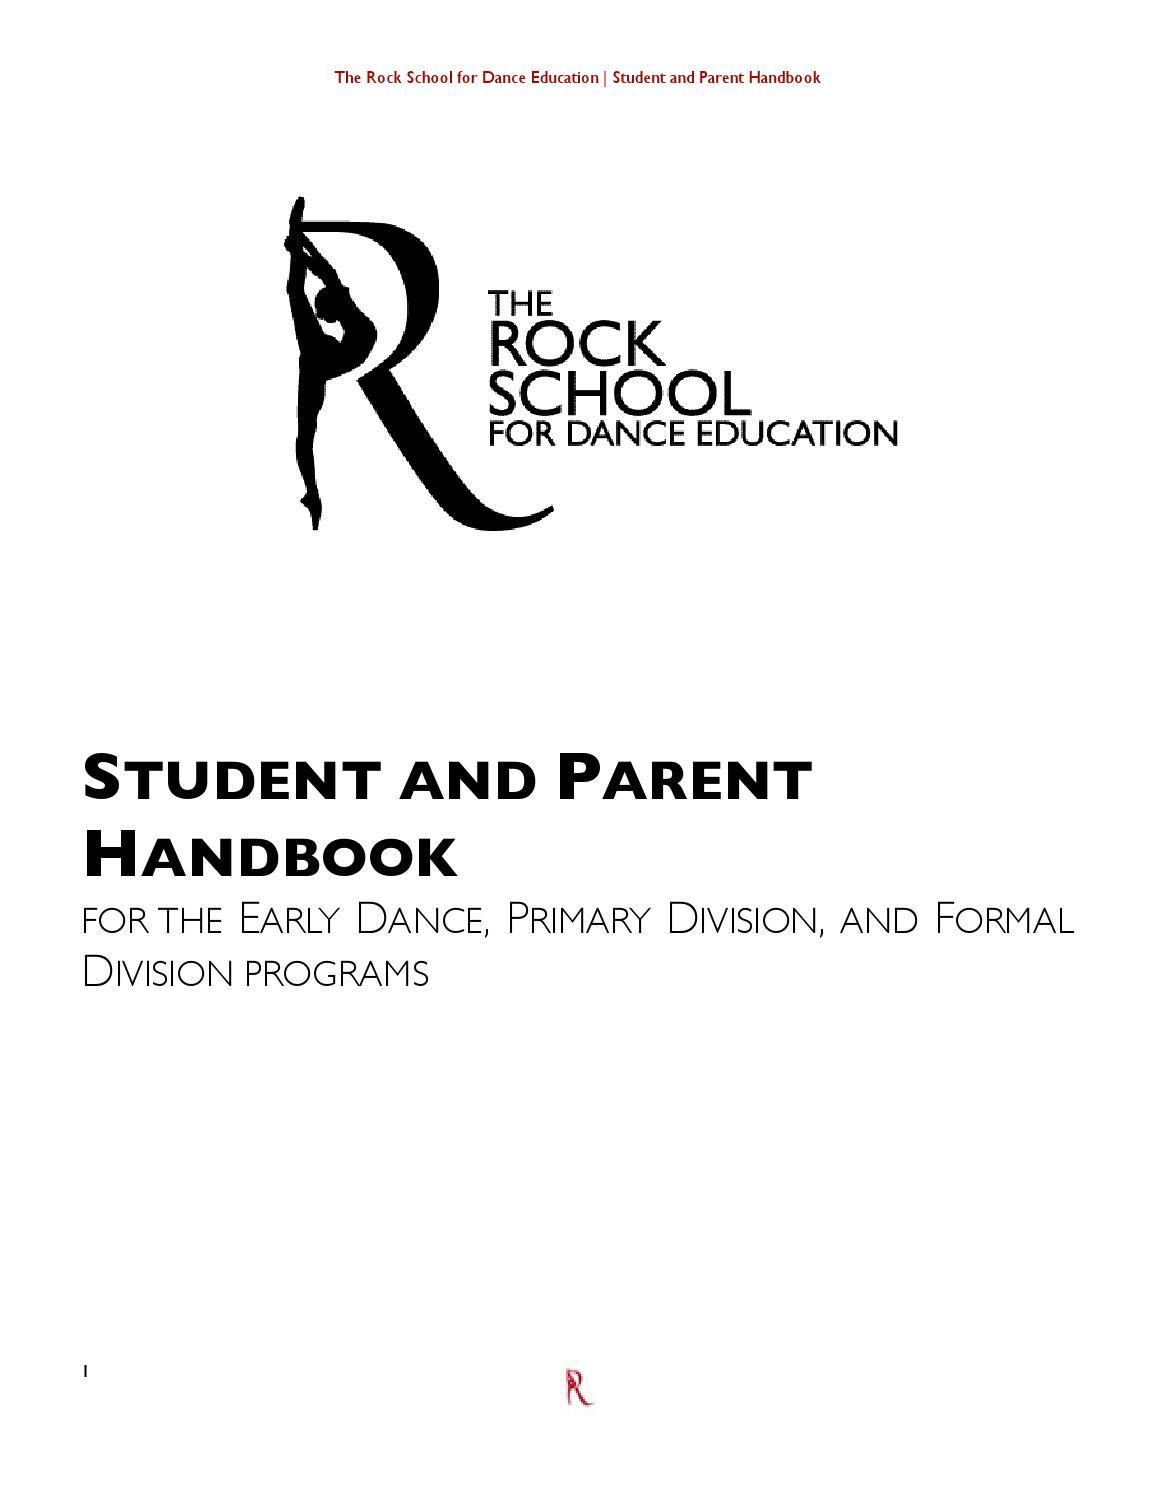 2014-2015 School Year: Student Handbook by The Rock School